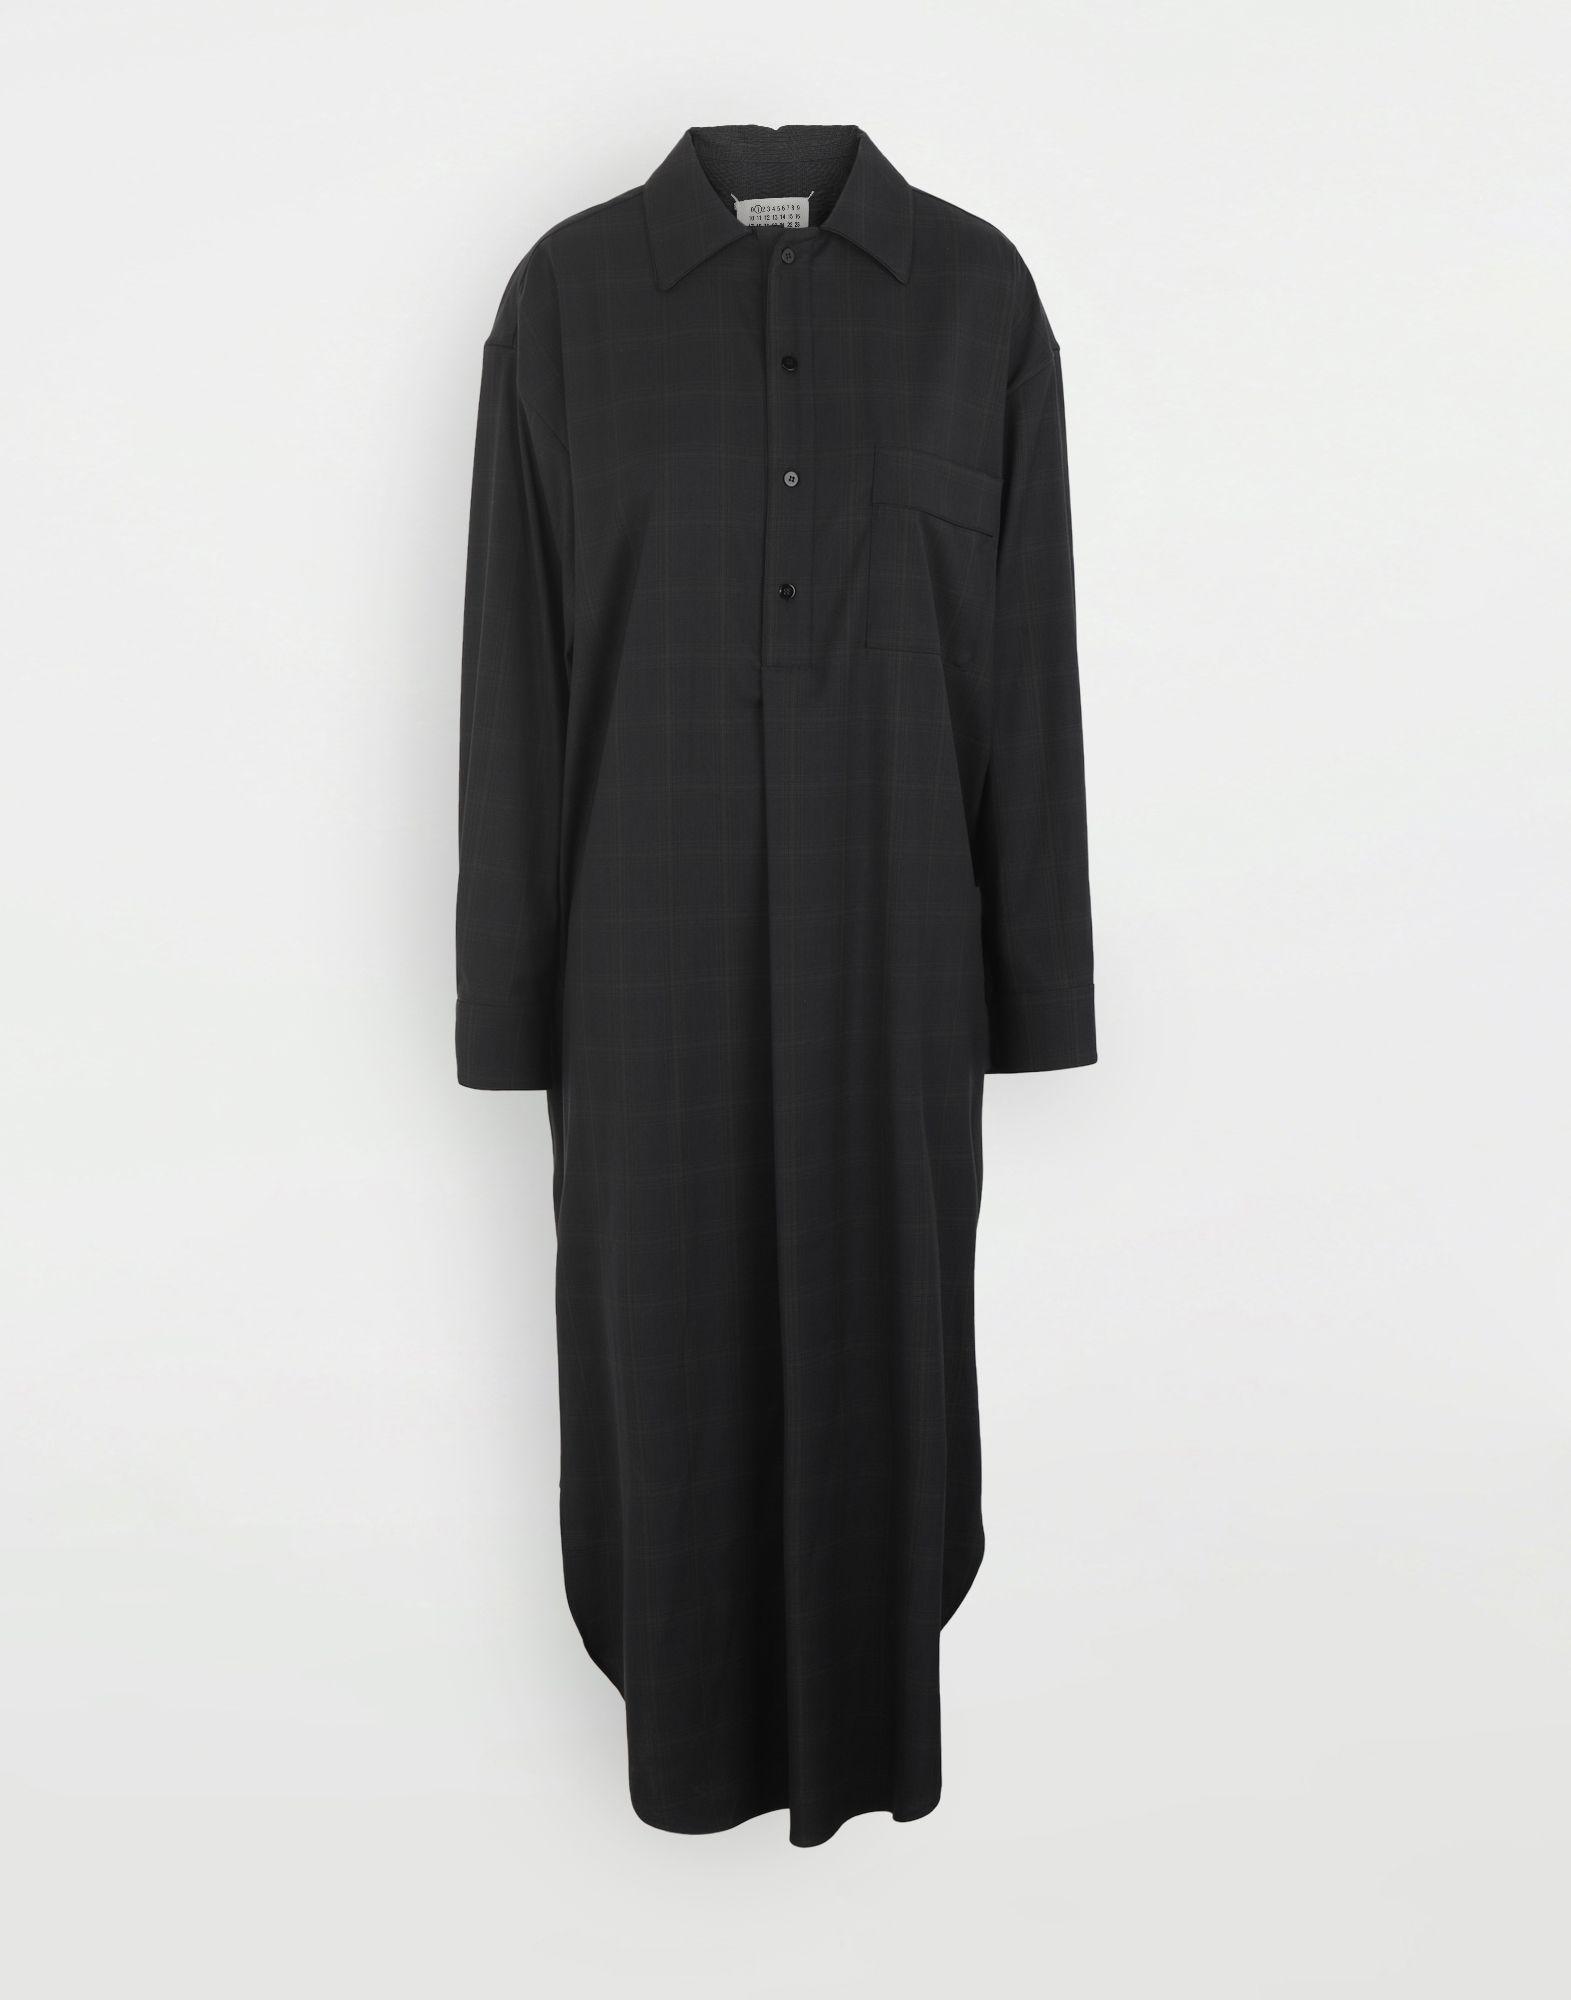 MAISON MARGIELA Kariertes Hemdkleid aus Wolle Kleid Dame f